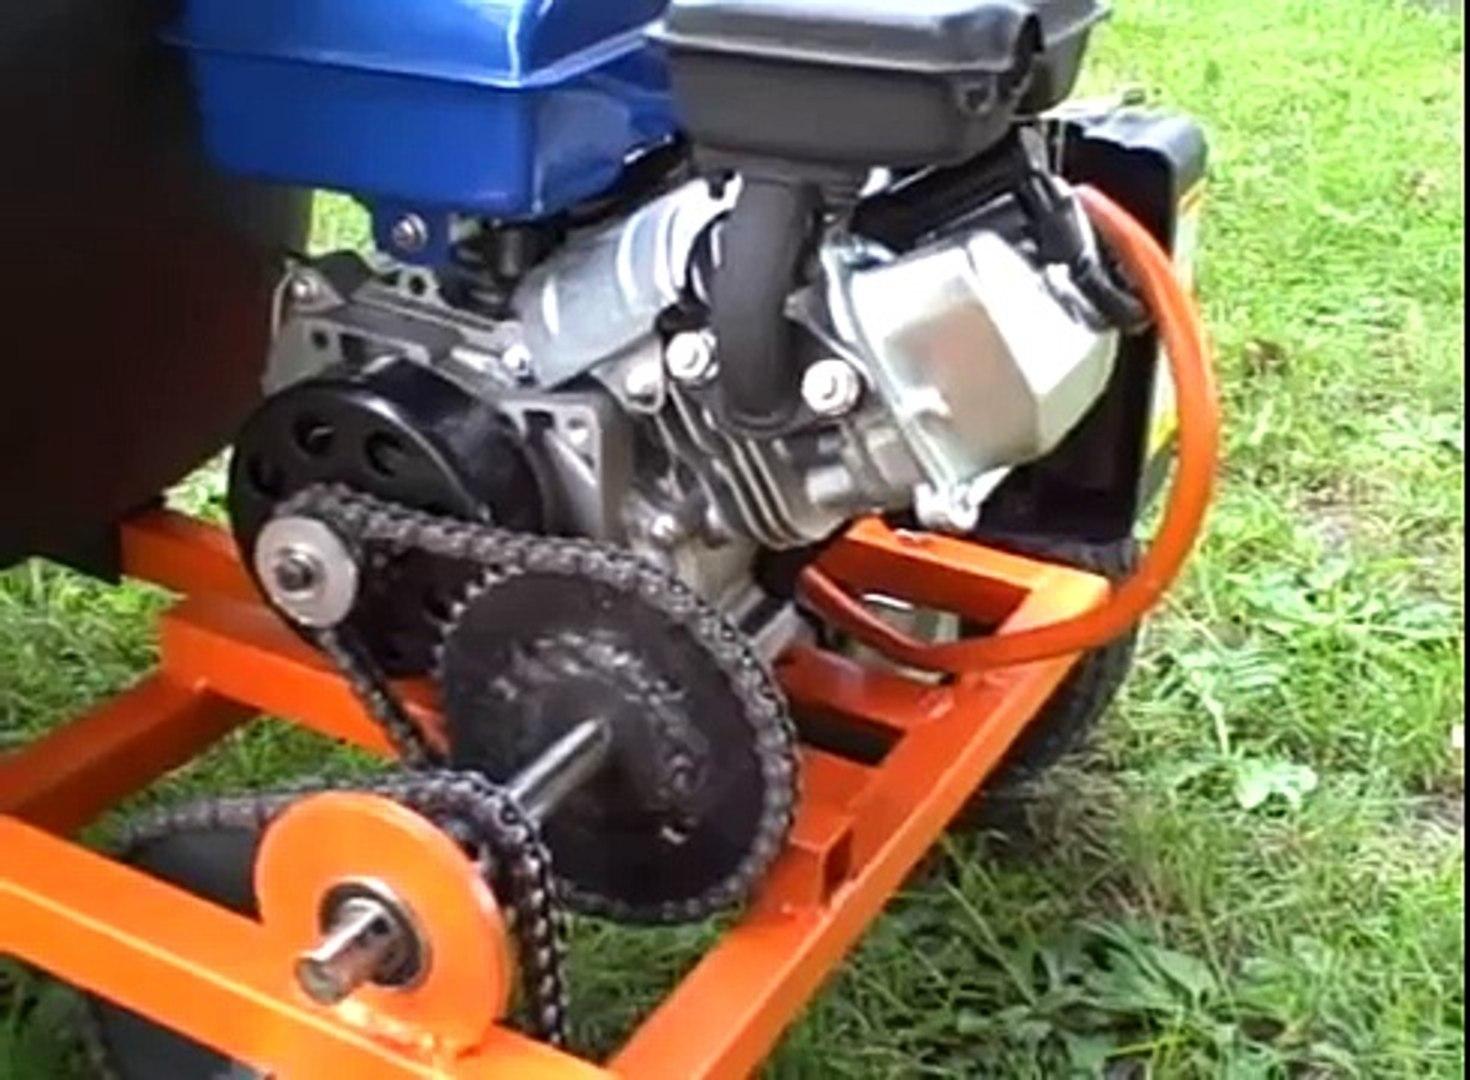 Homemade gokart (gocart) with Harbor Freight 2 5 hp engine 79cc